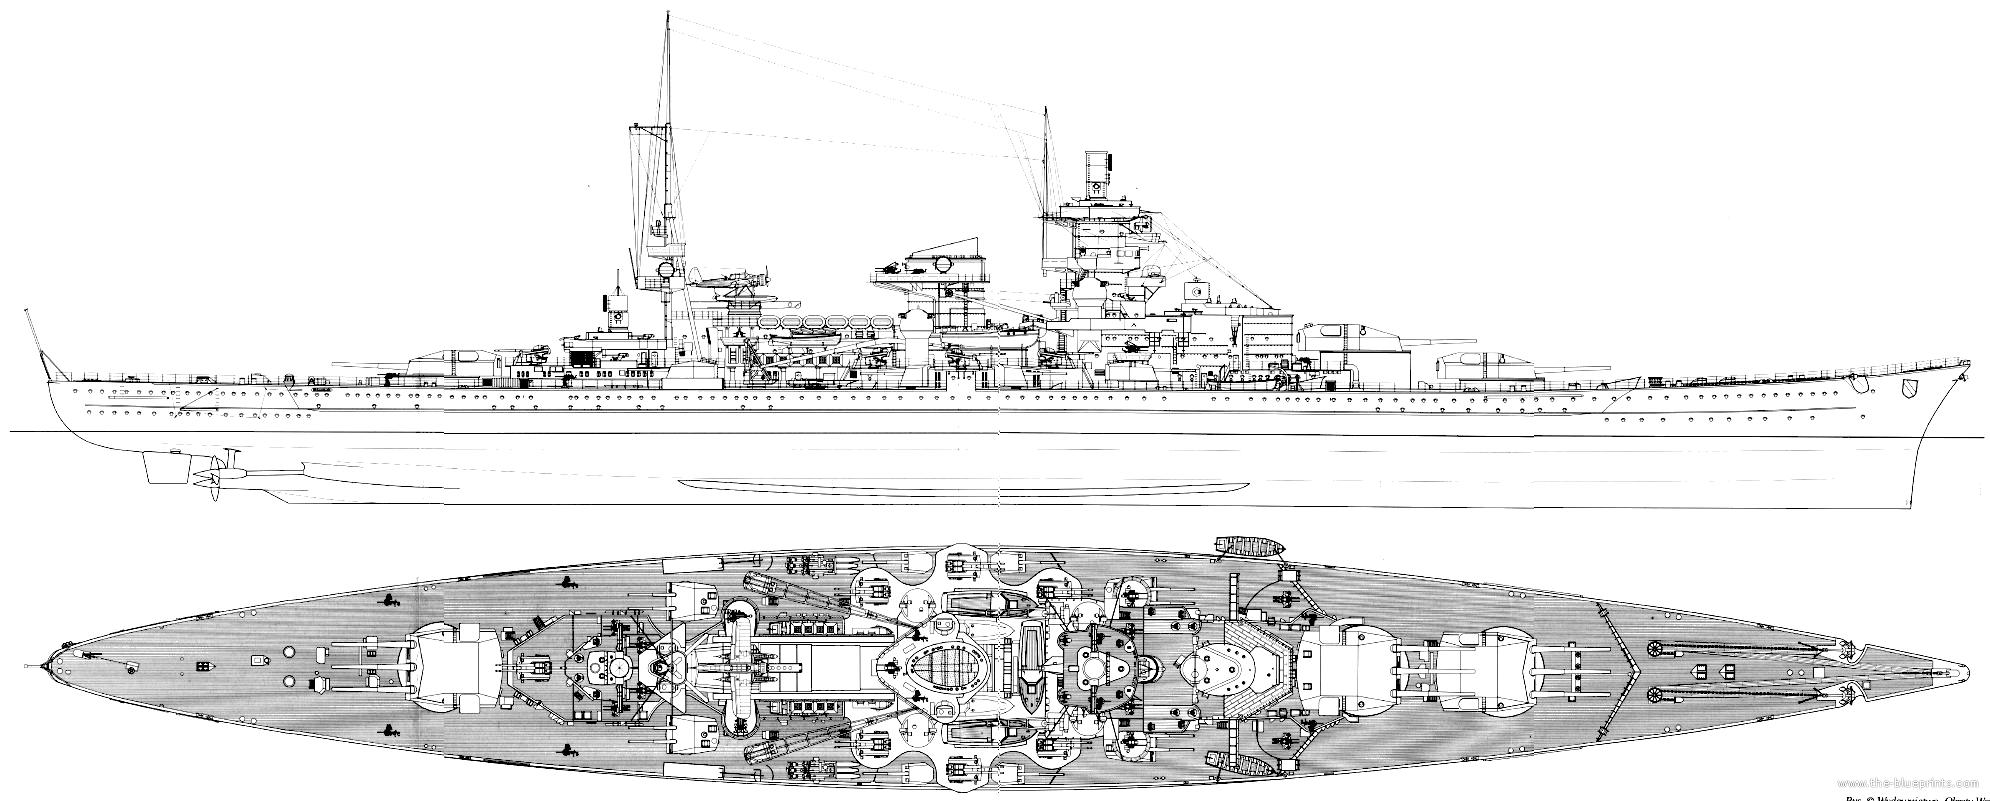 Dkm Scharnhorst 1943  Battleship